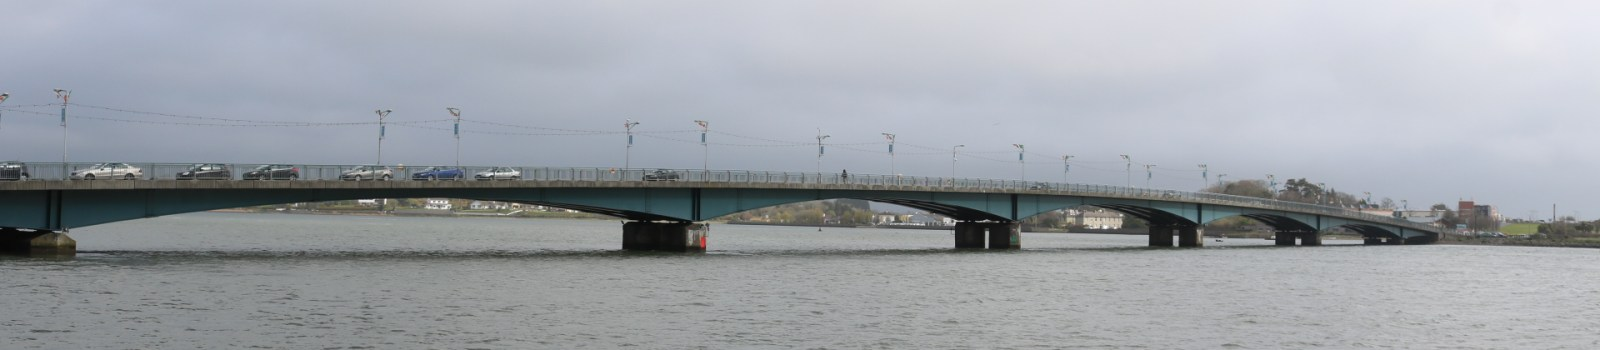 Wexford Harbour Bridge